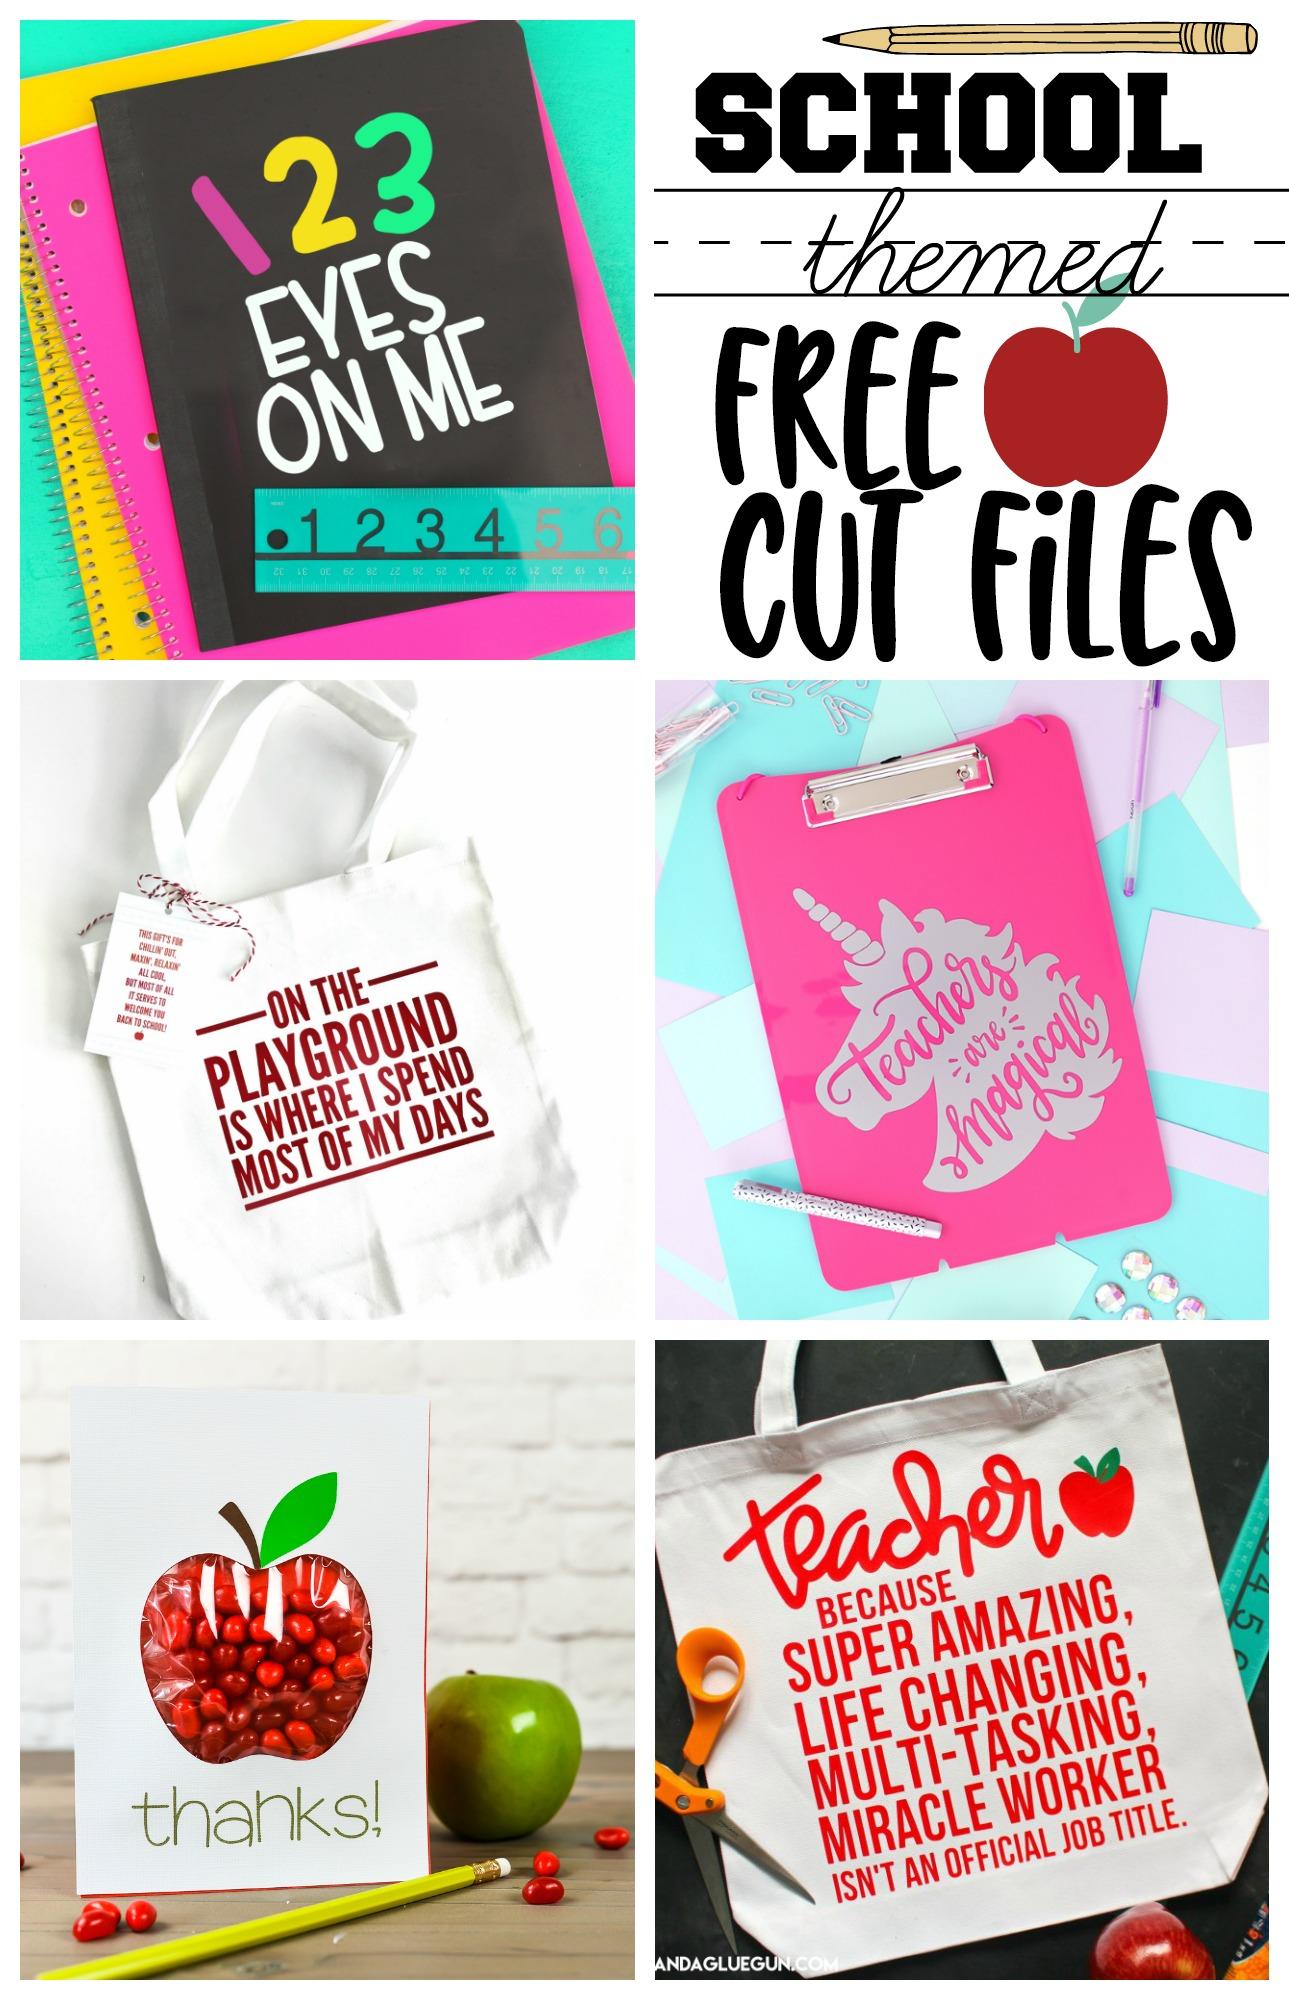 School themed free cut files